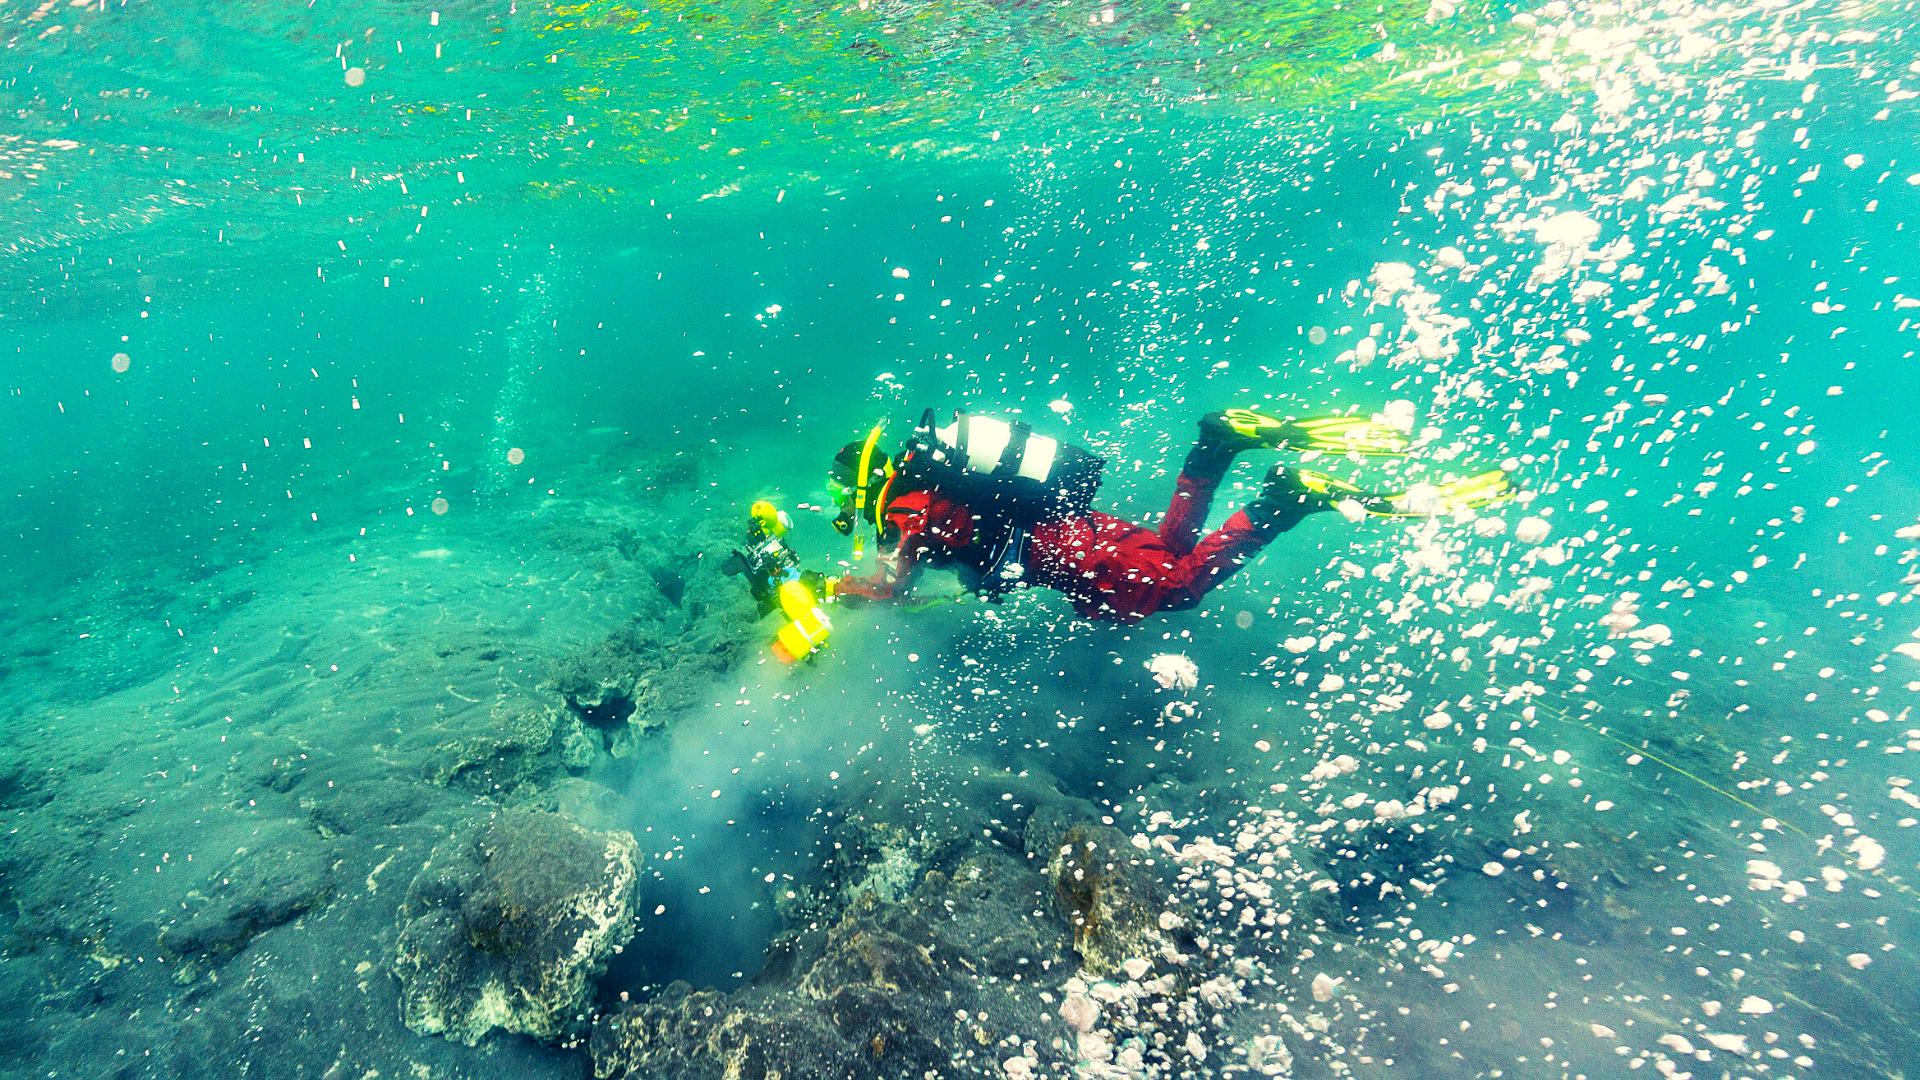 Hot spring diving tour